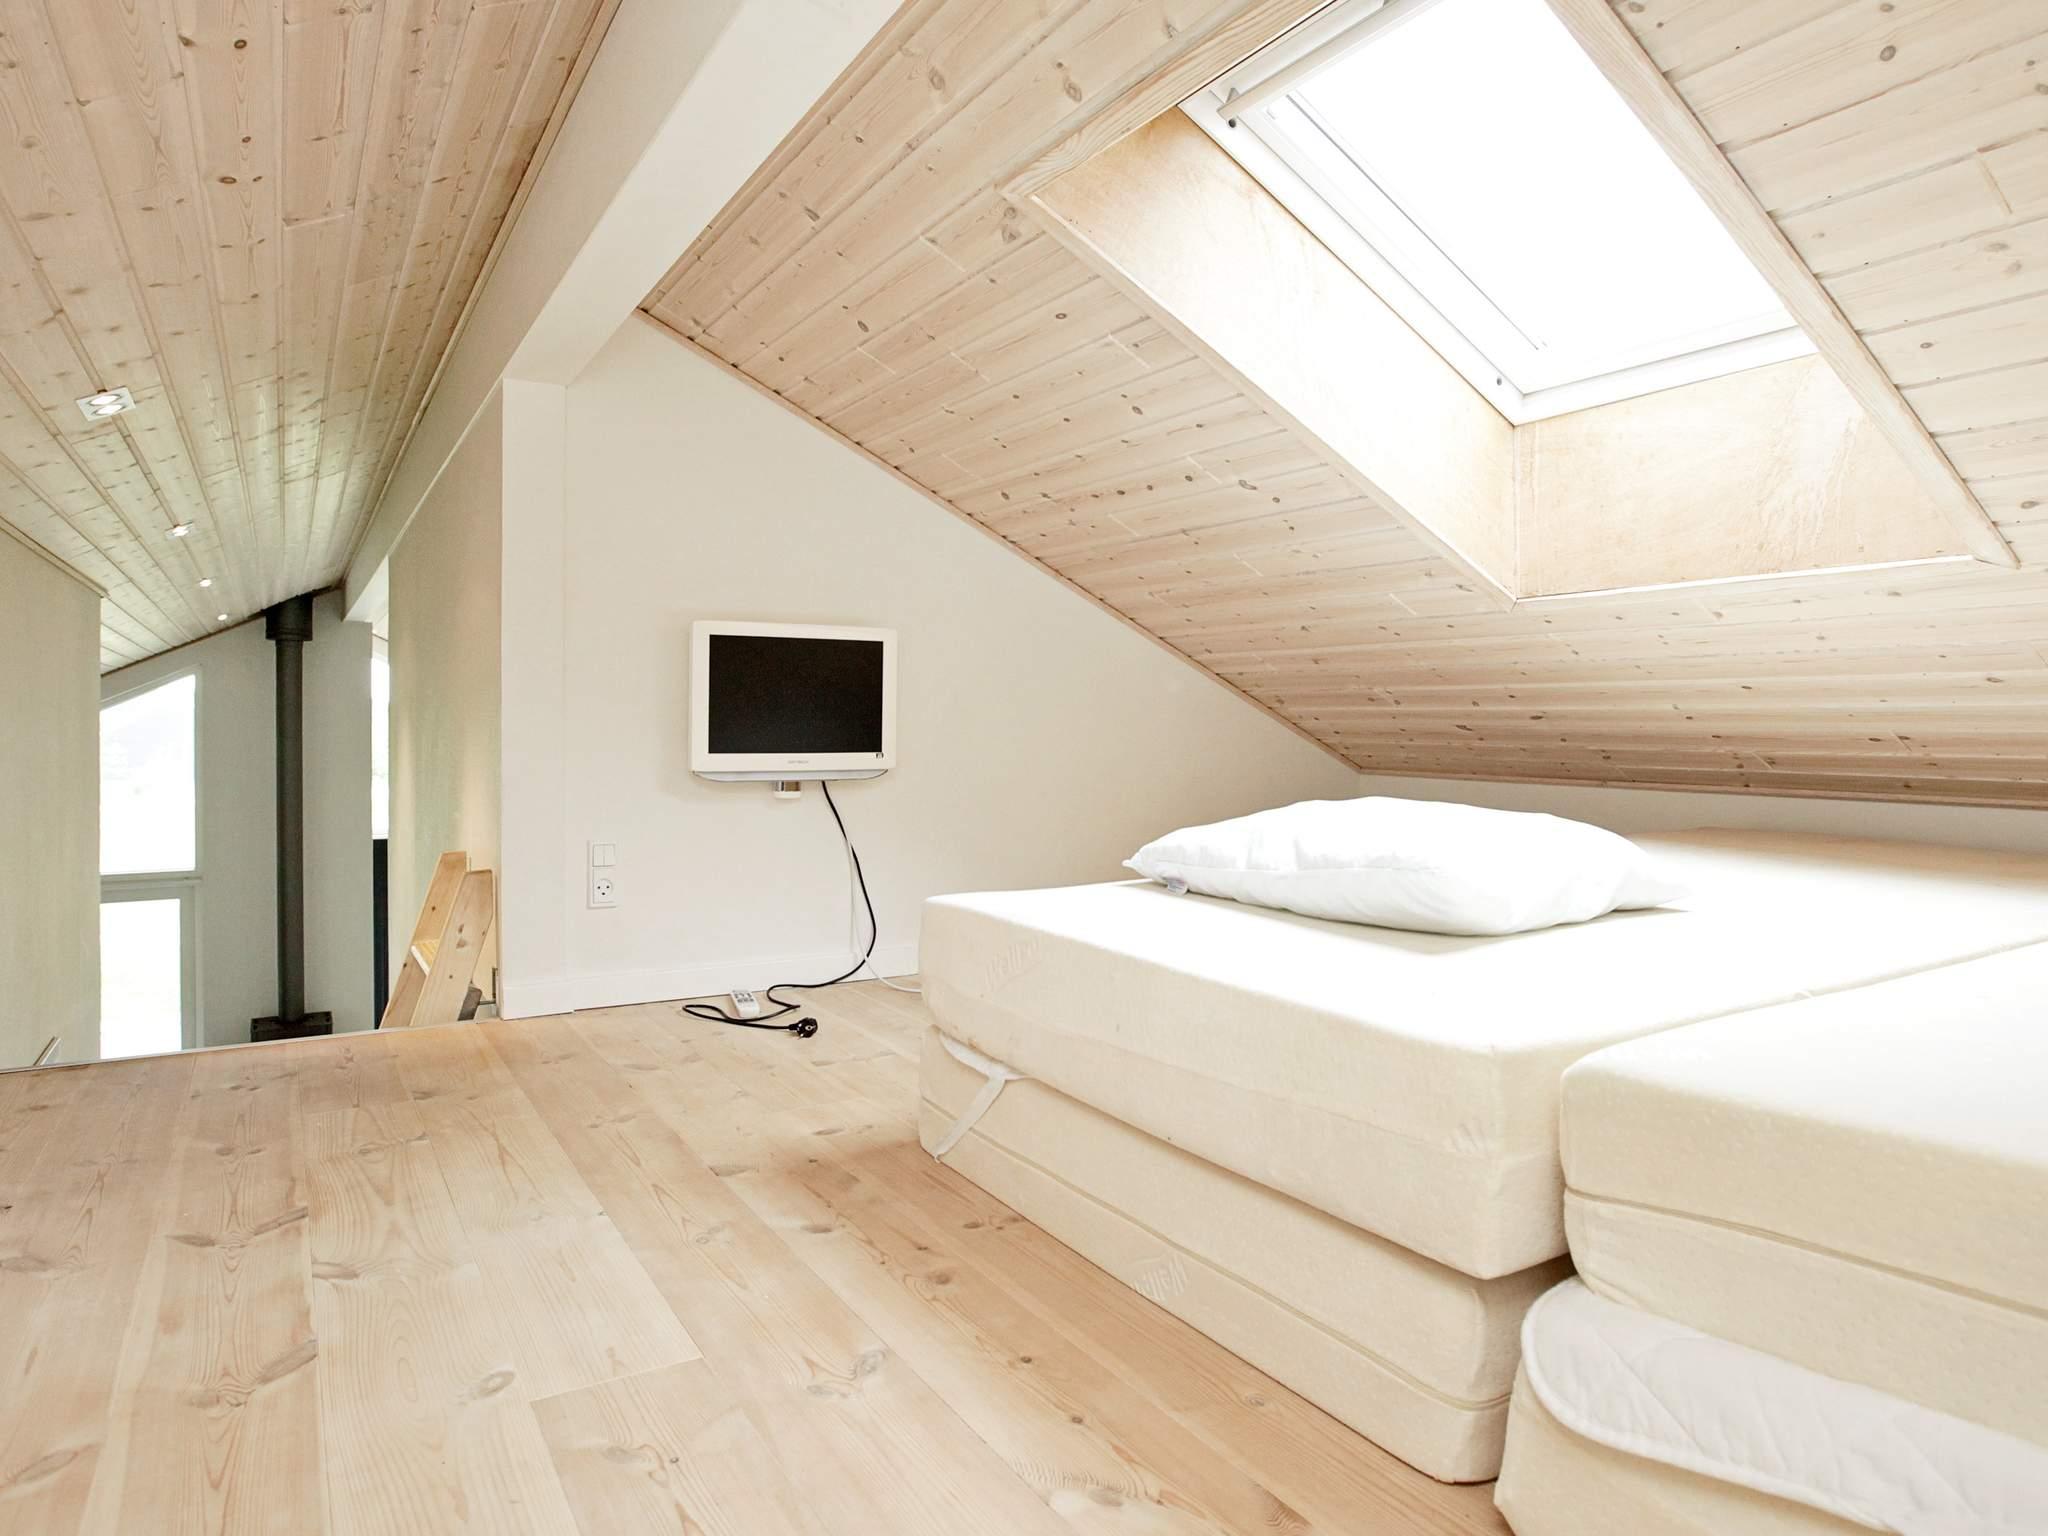 Ferienhaus Tranum Strand (379541), Tranum Enge, , Nordwestjütland, Dänemark, Bild 12